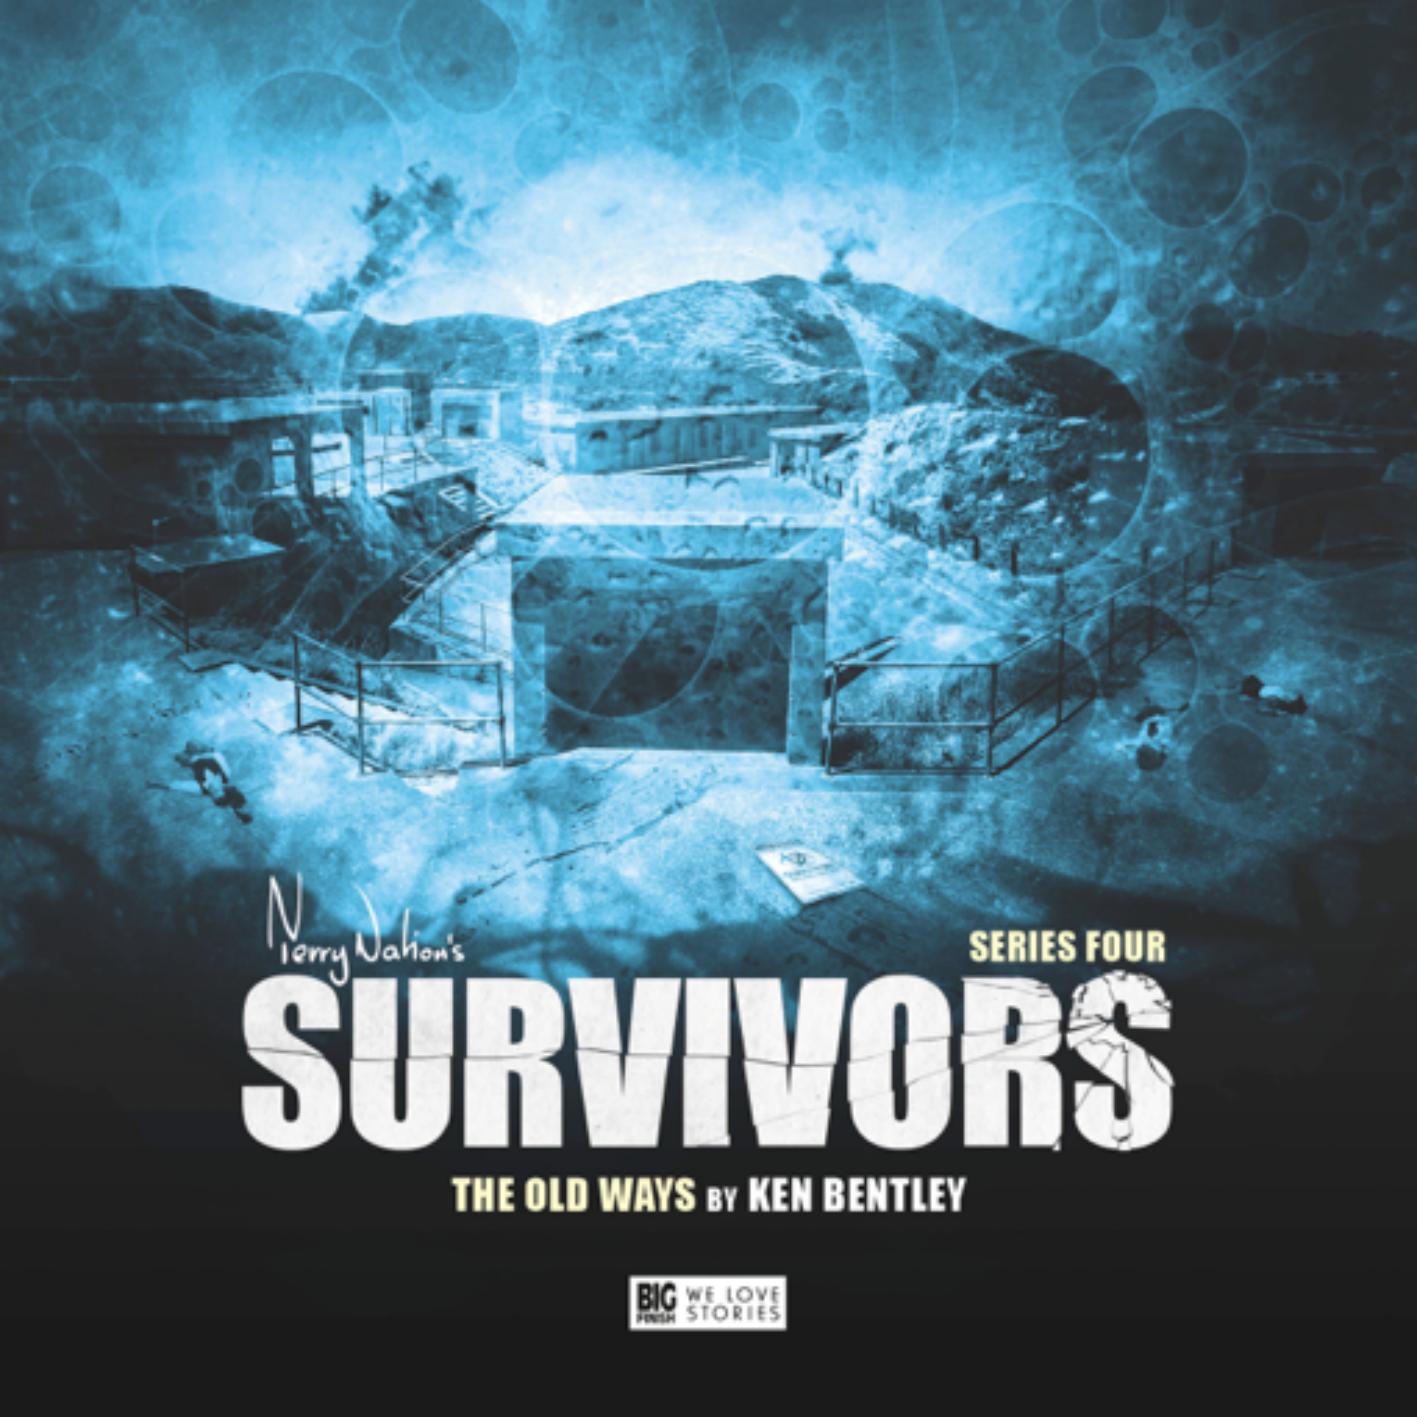 Episode image for Survivors 4:1 The Old Ways